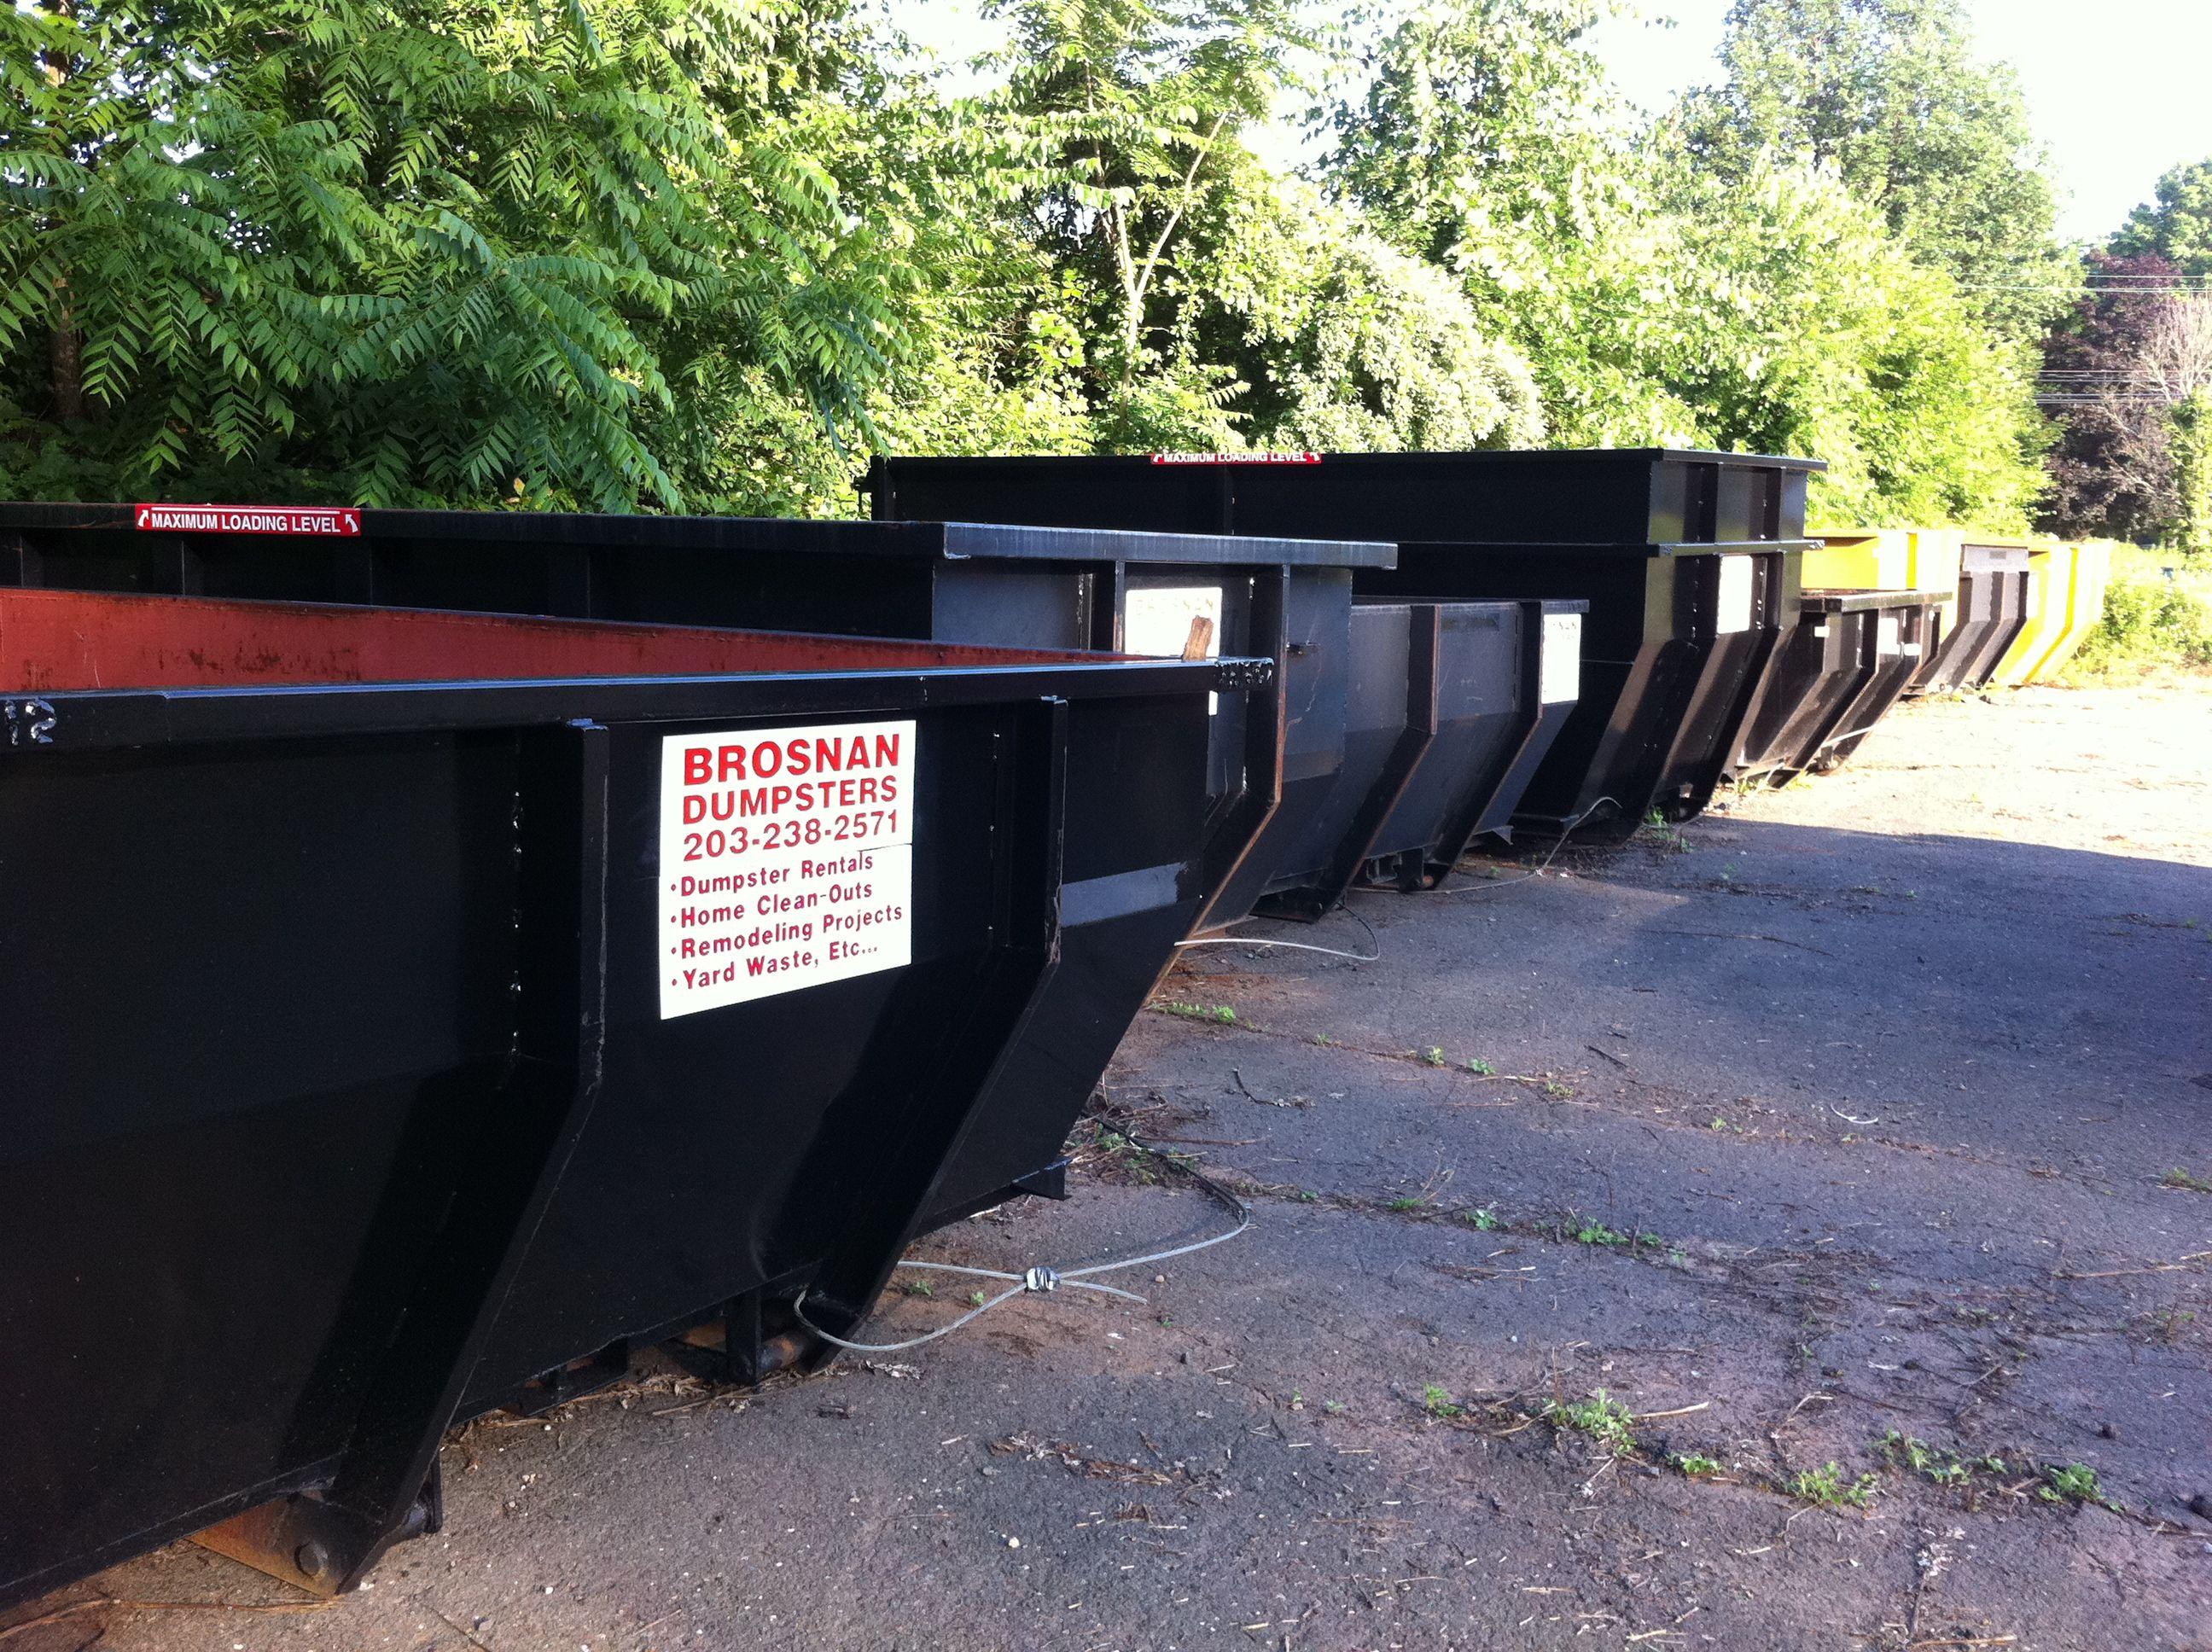 Brosnan dumpsters llc serving the meriden area we offer